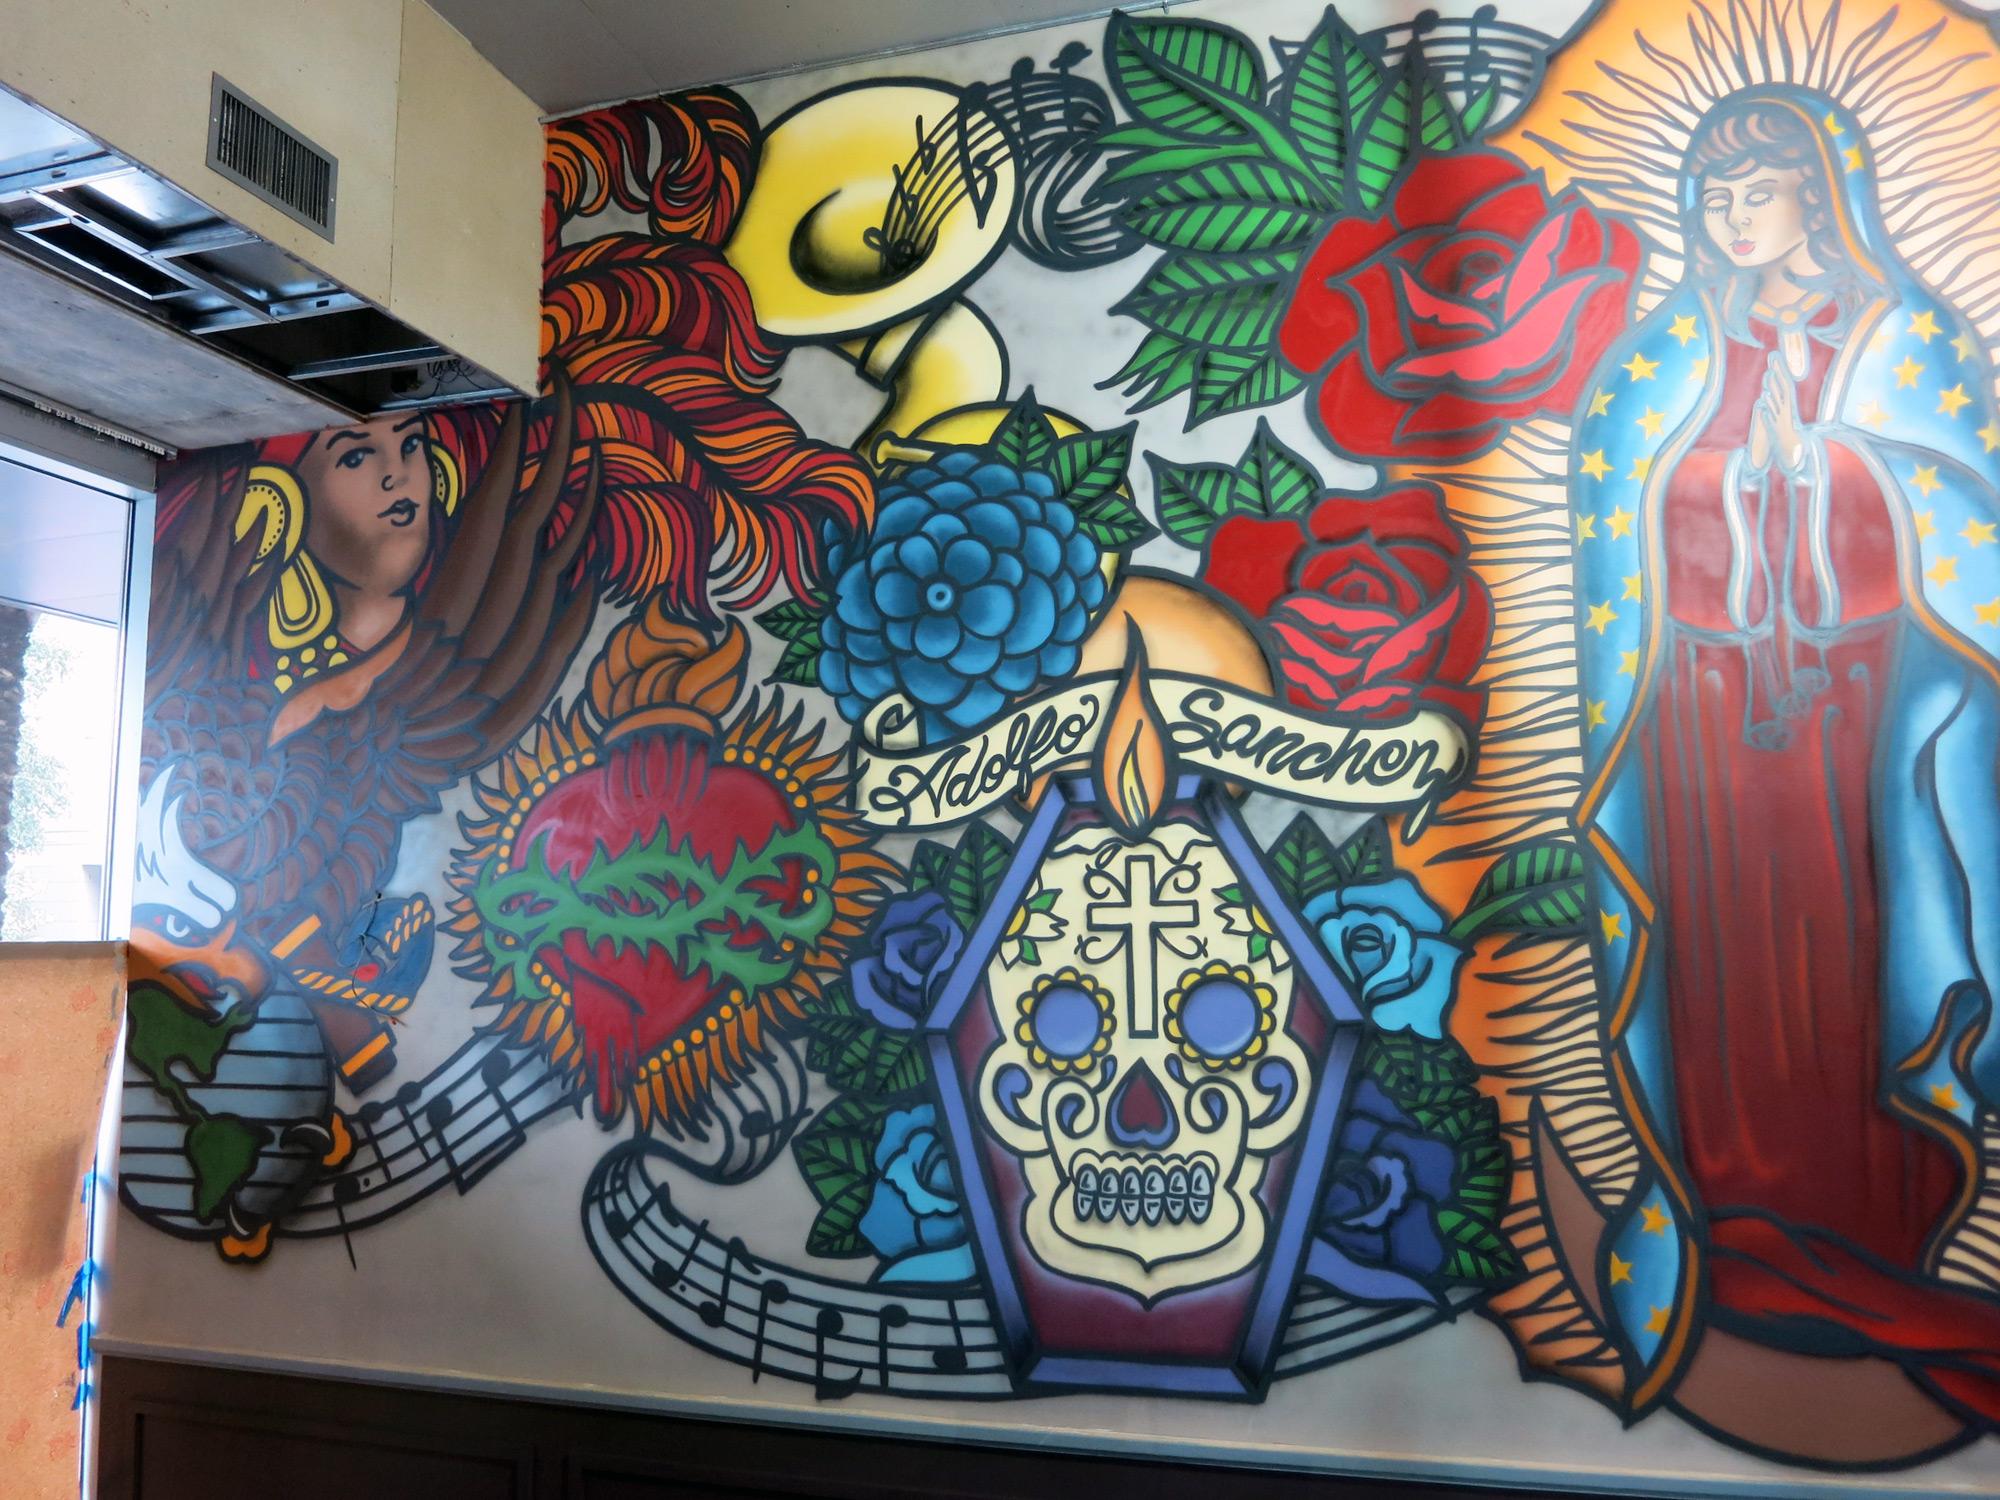 New Orleans Graffiti Artist